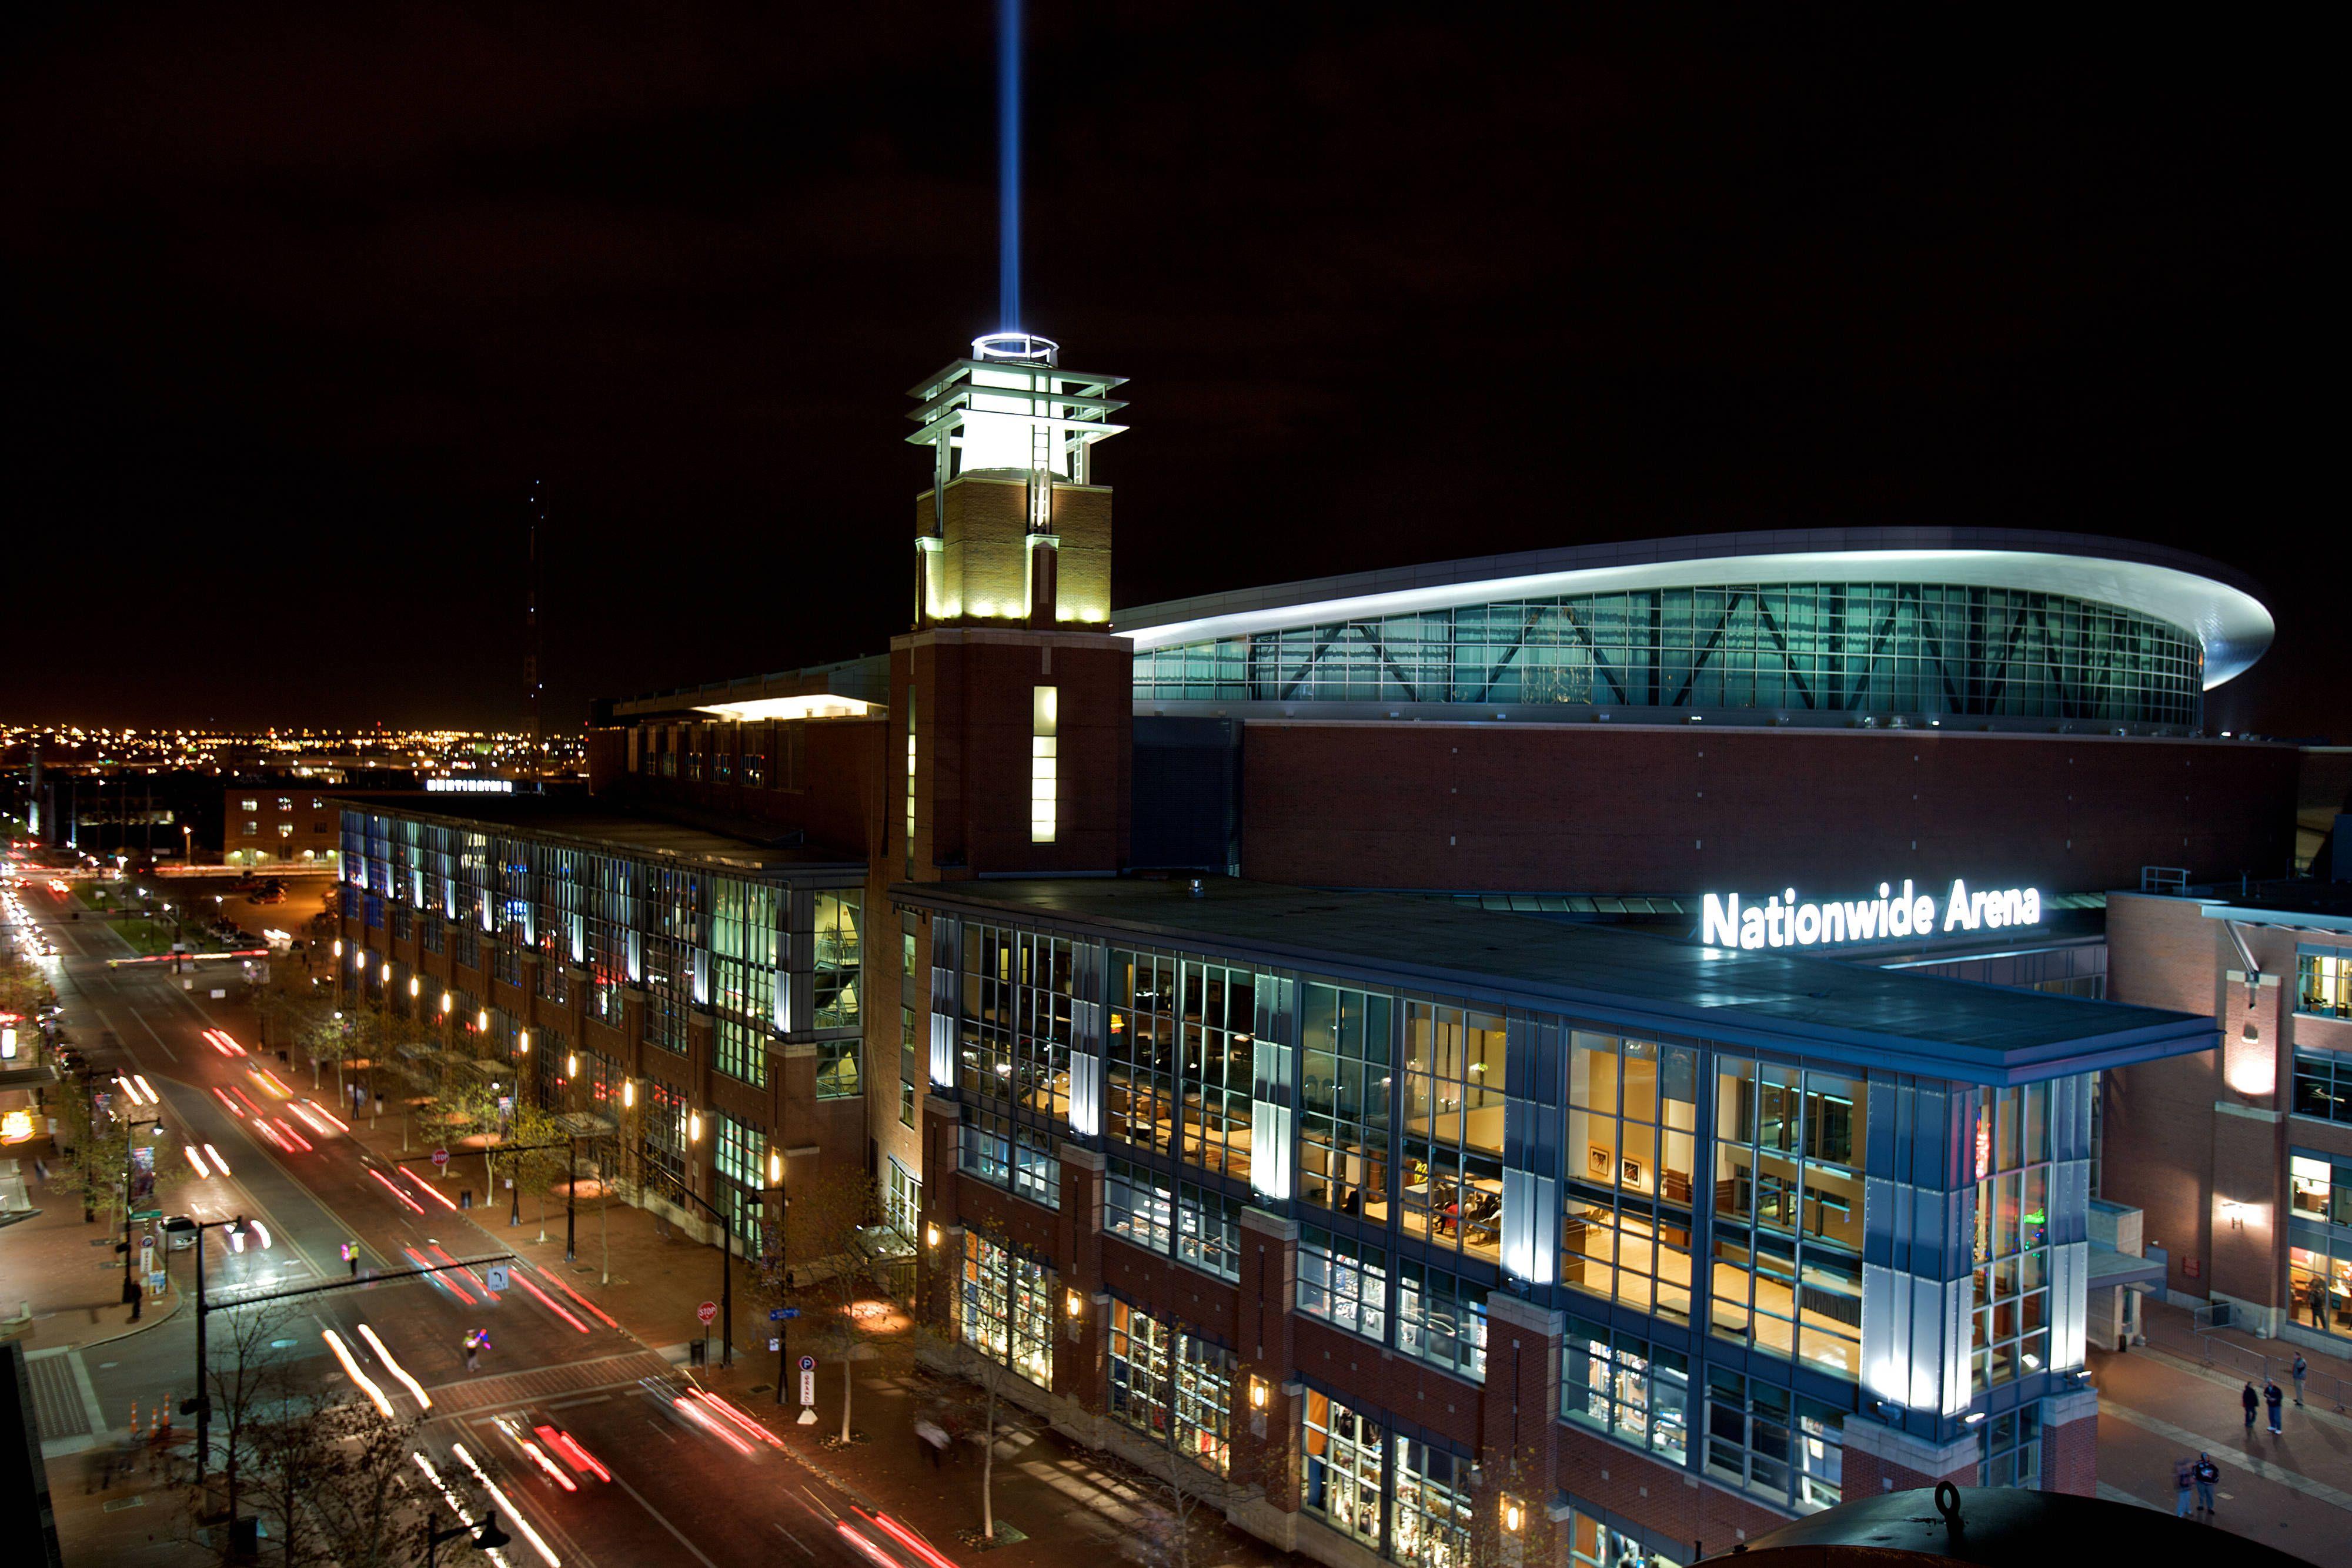 Marriott Columbus University Area Nationwide Arena Enjoying